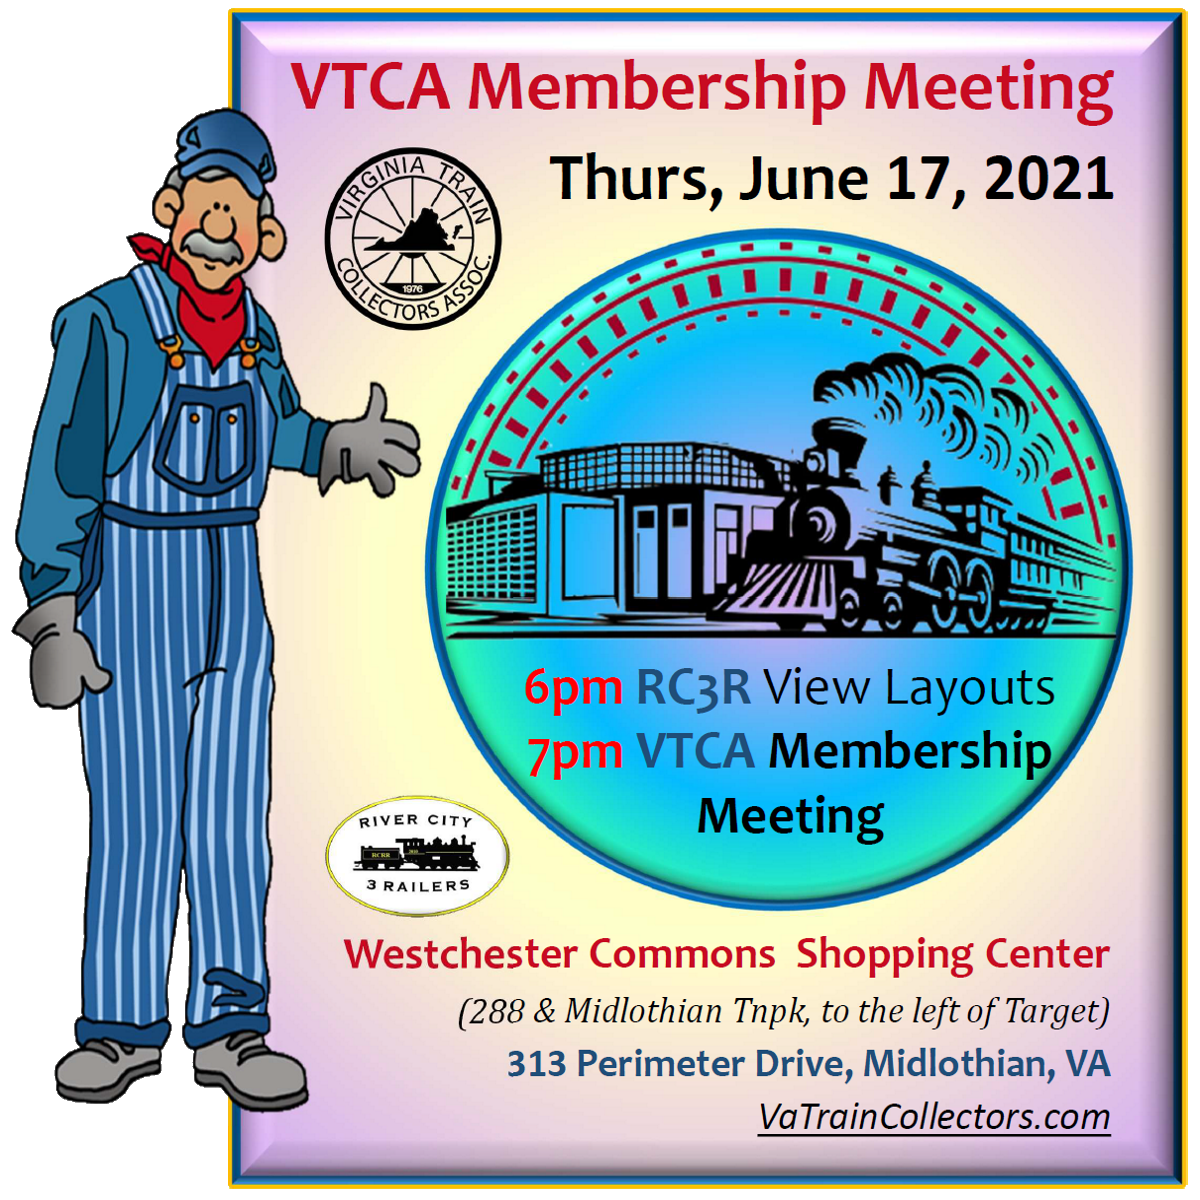 VTCA Membership Meeting